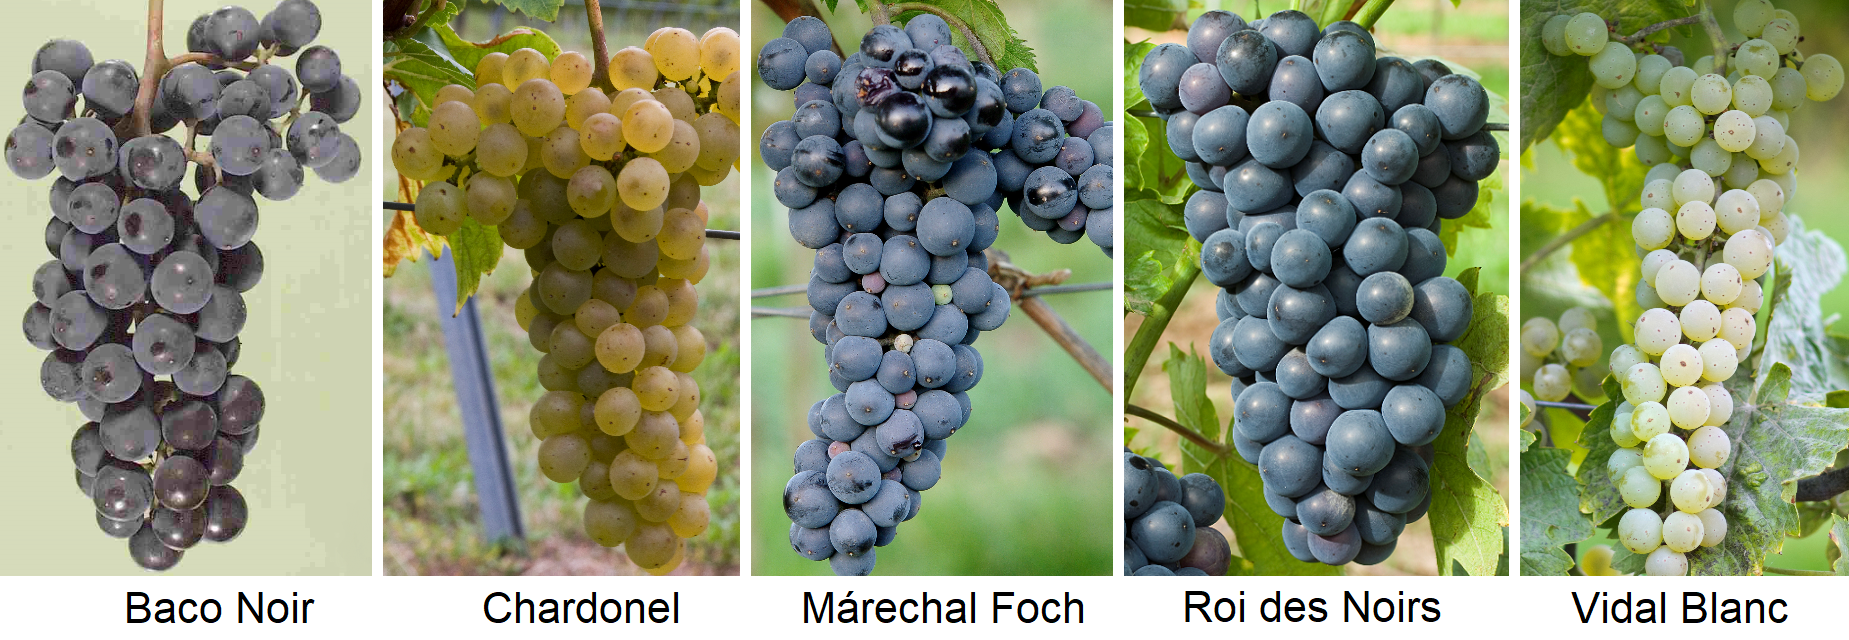 French hybrids: Baco Noir, Chardonel, Márechal Foch, Roi des Noirs, Vidal Blanc